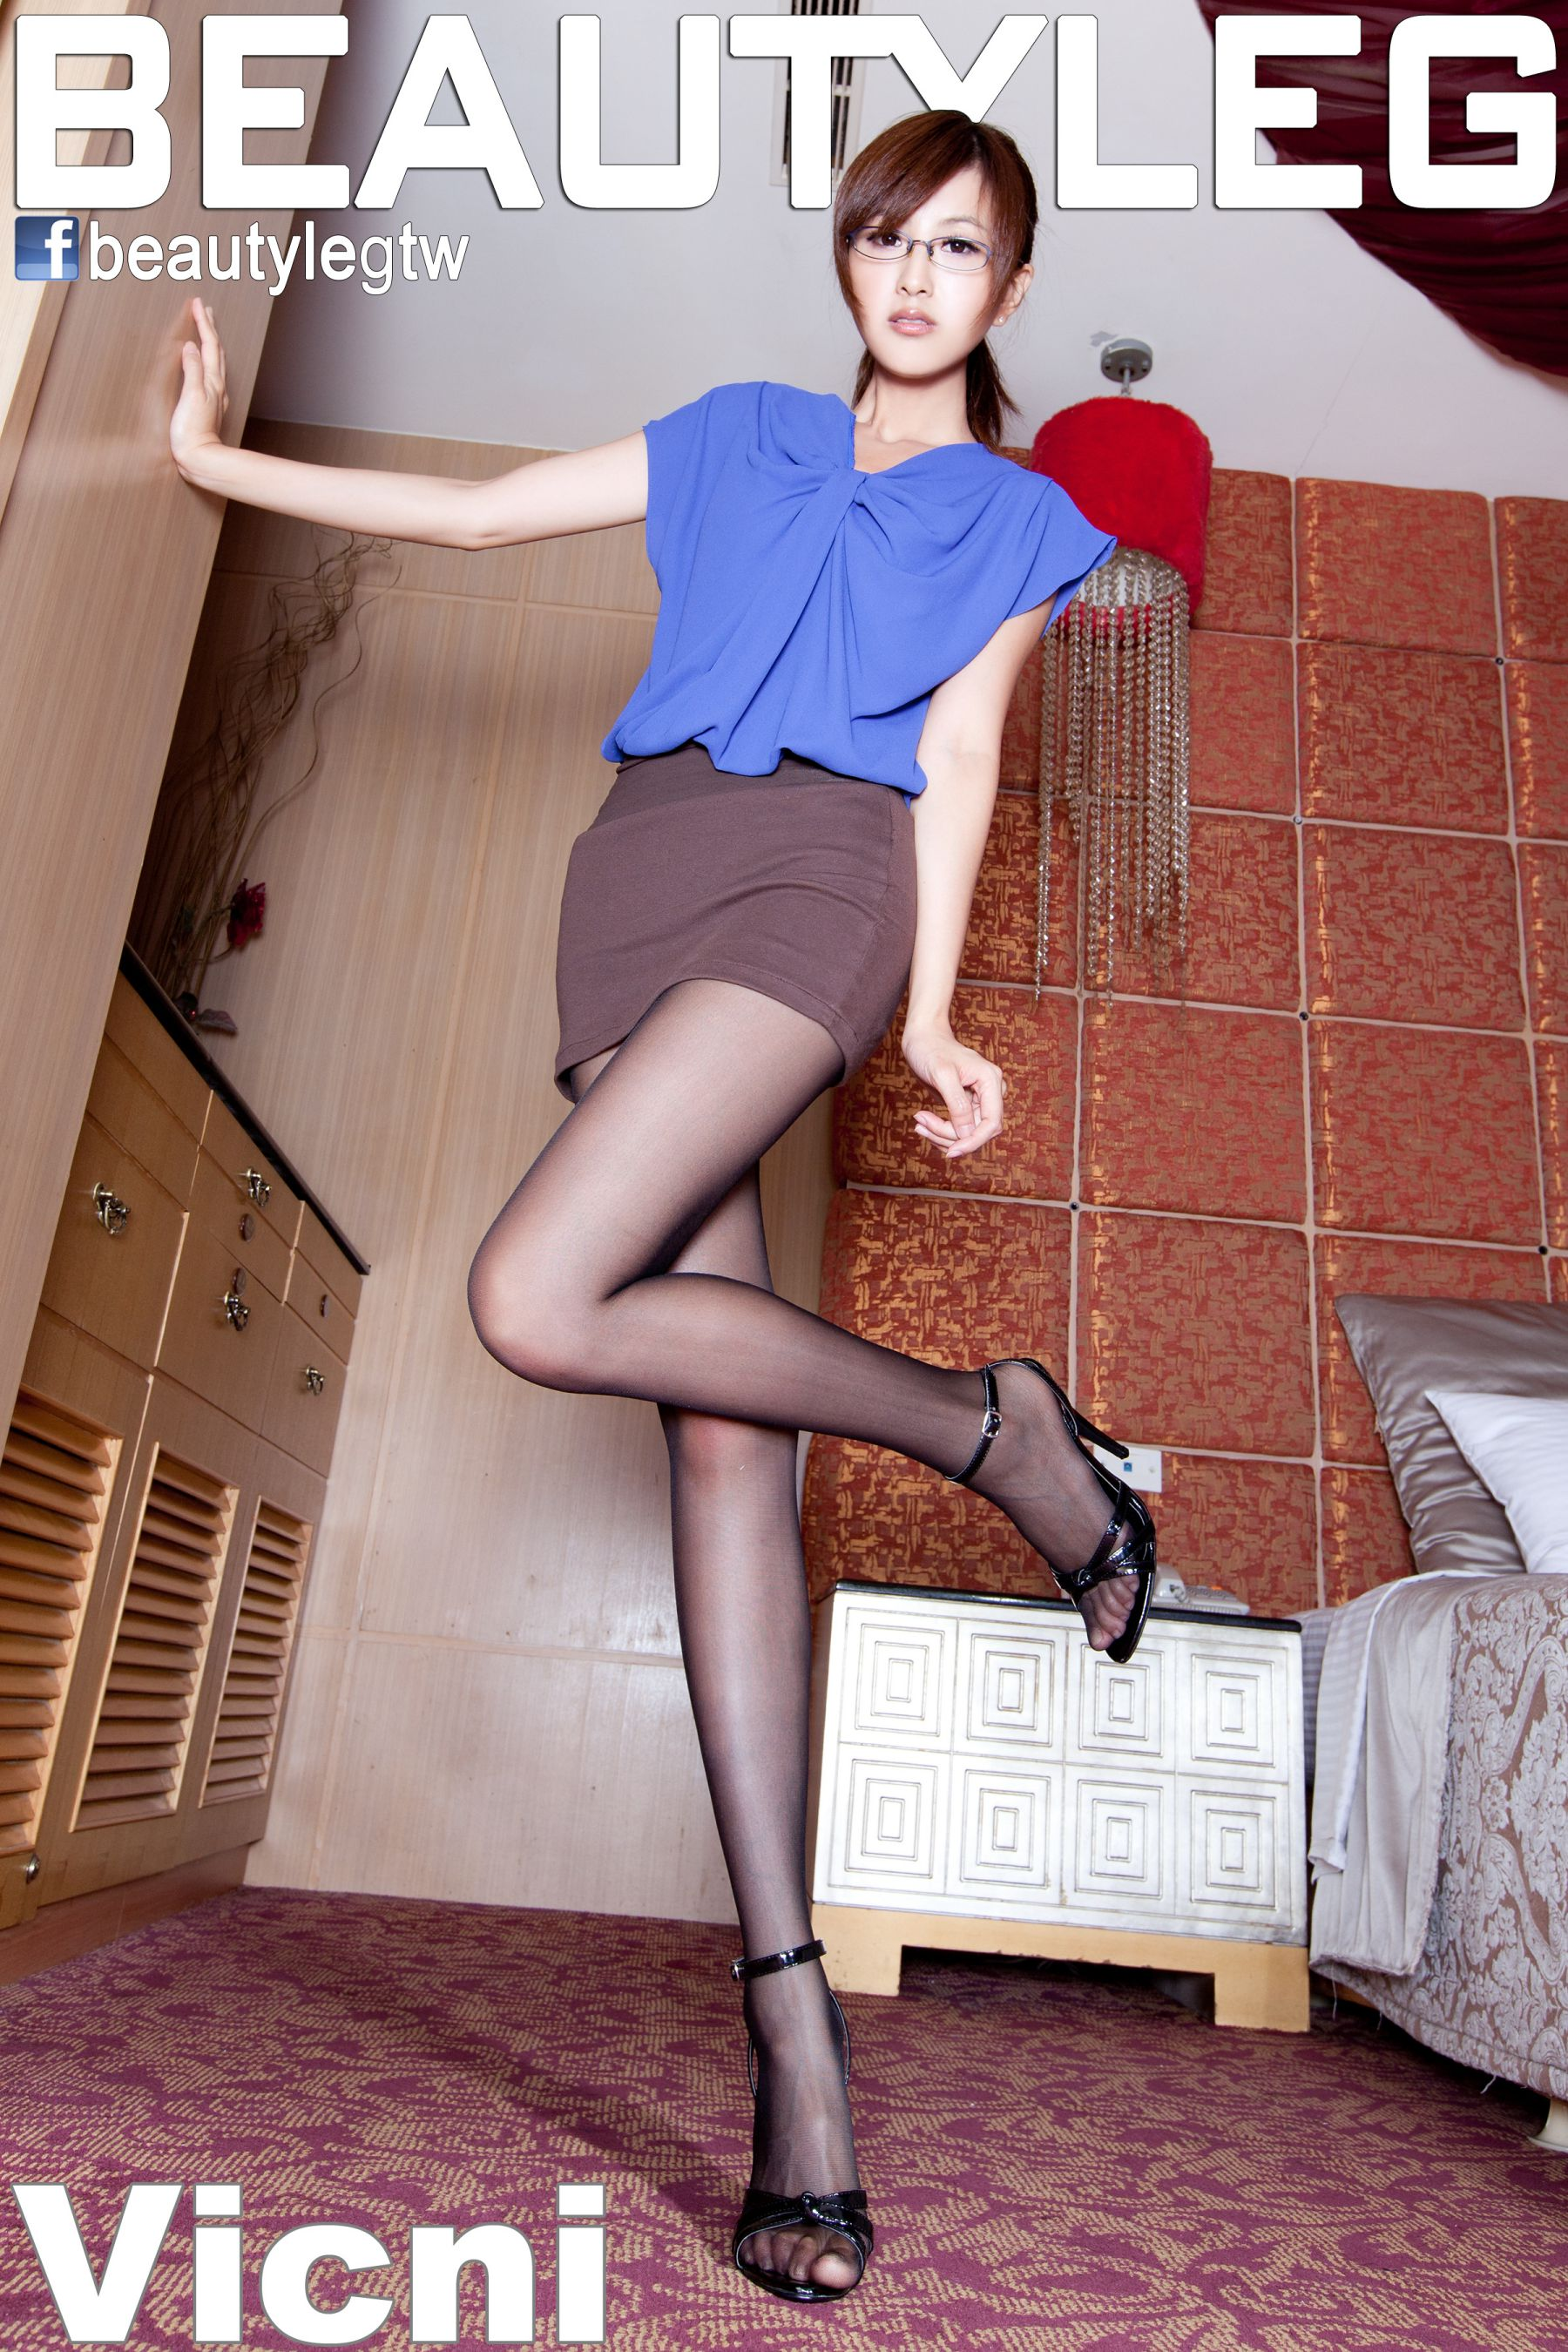 VOL.378 [Beautyleg]高跟美腿:简晓育(腿模Vicni,晓育儿)高品质写真套图(41P)